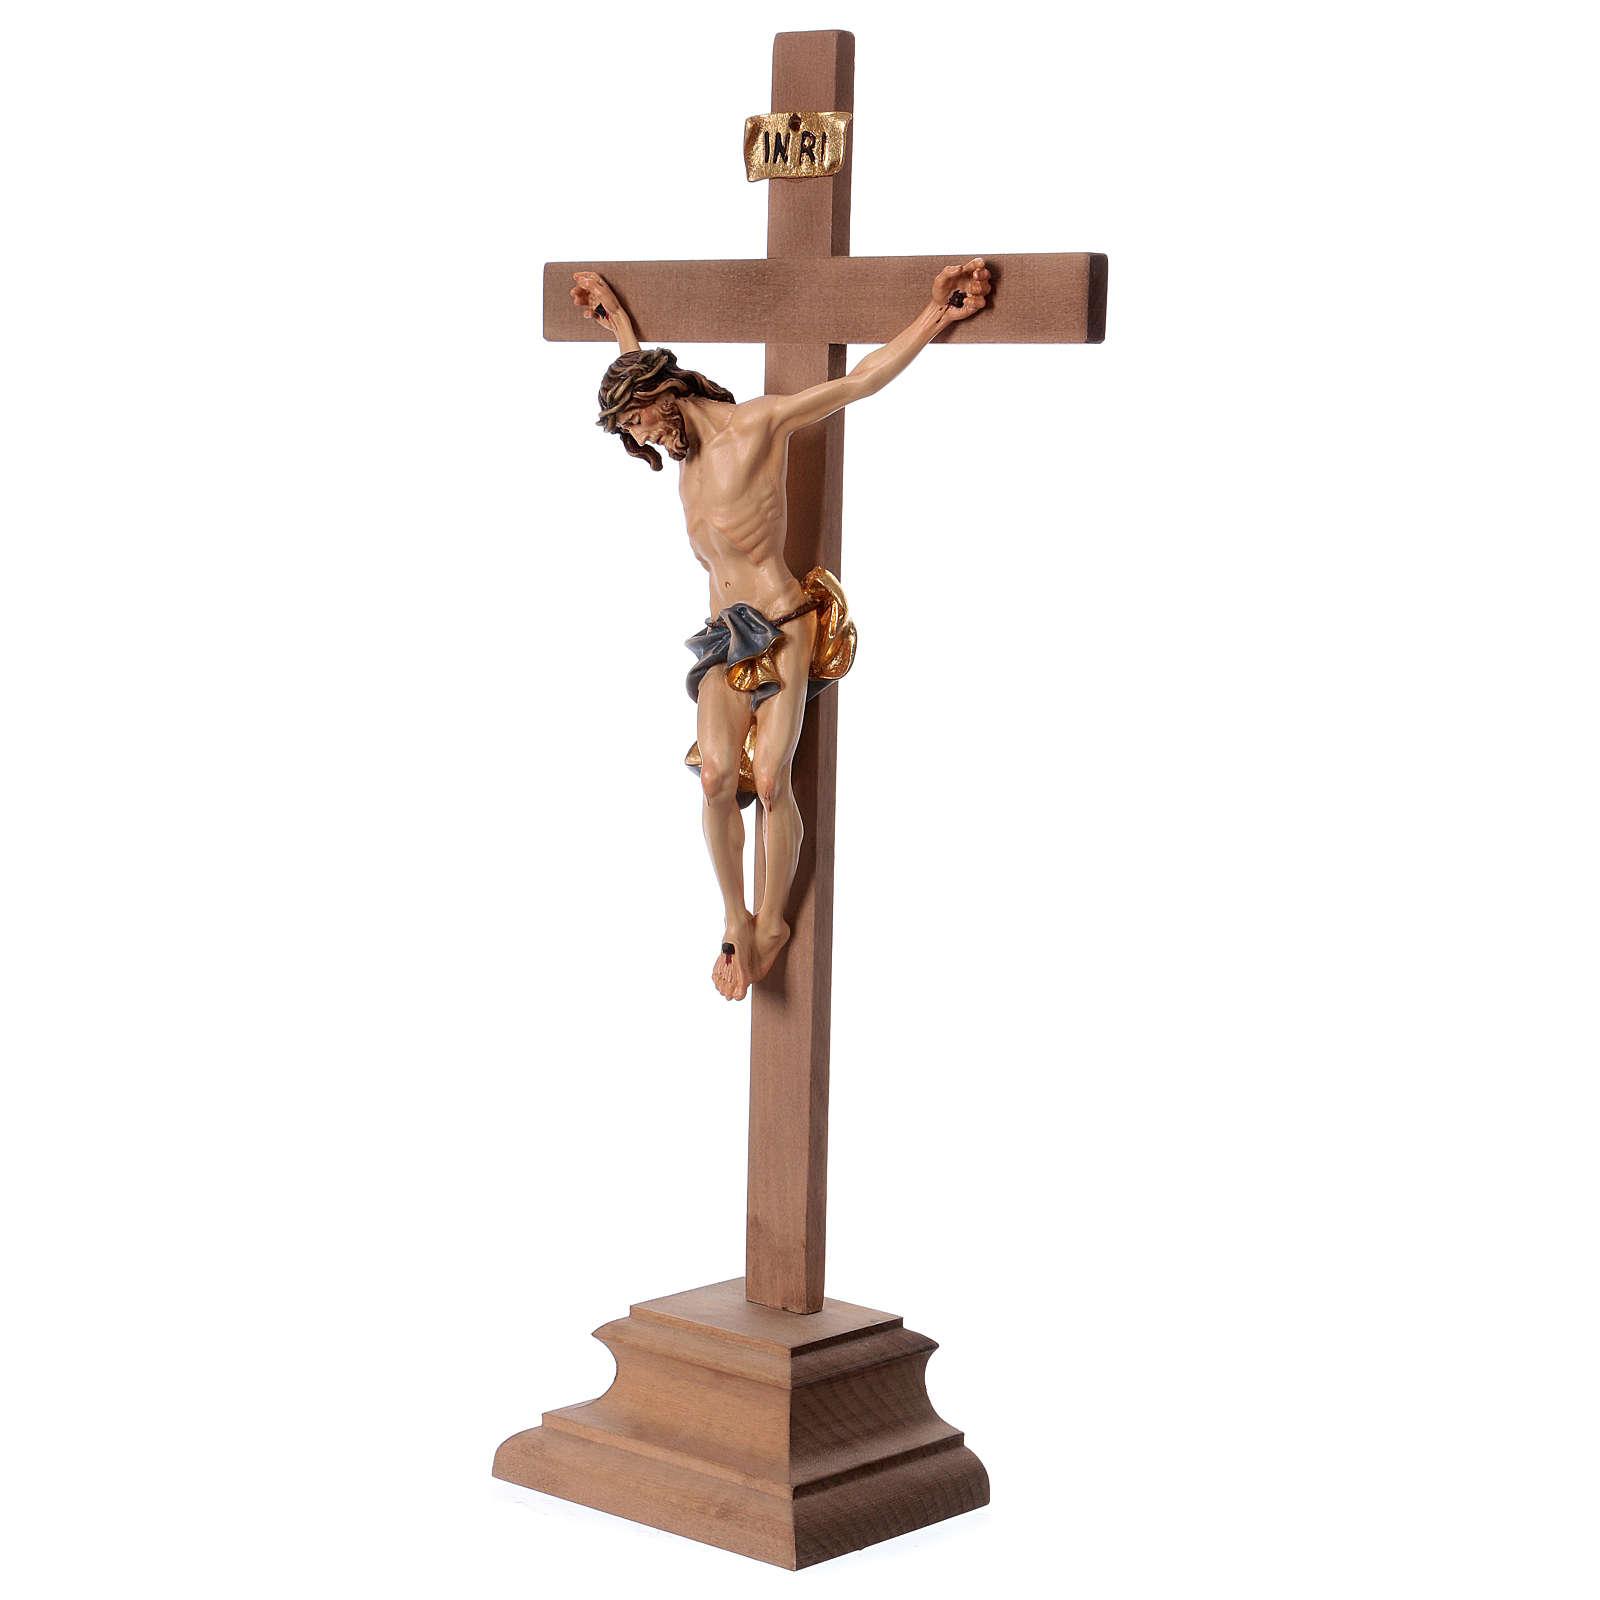 Kruzifix mit Basis blaue Kleidung Barock Stil Grödnertal Holz 4